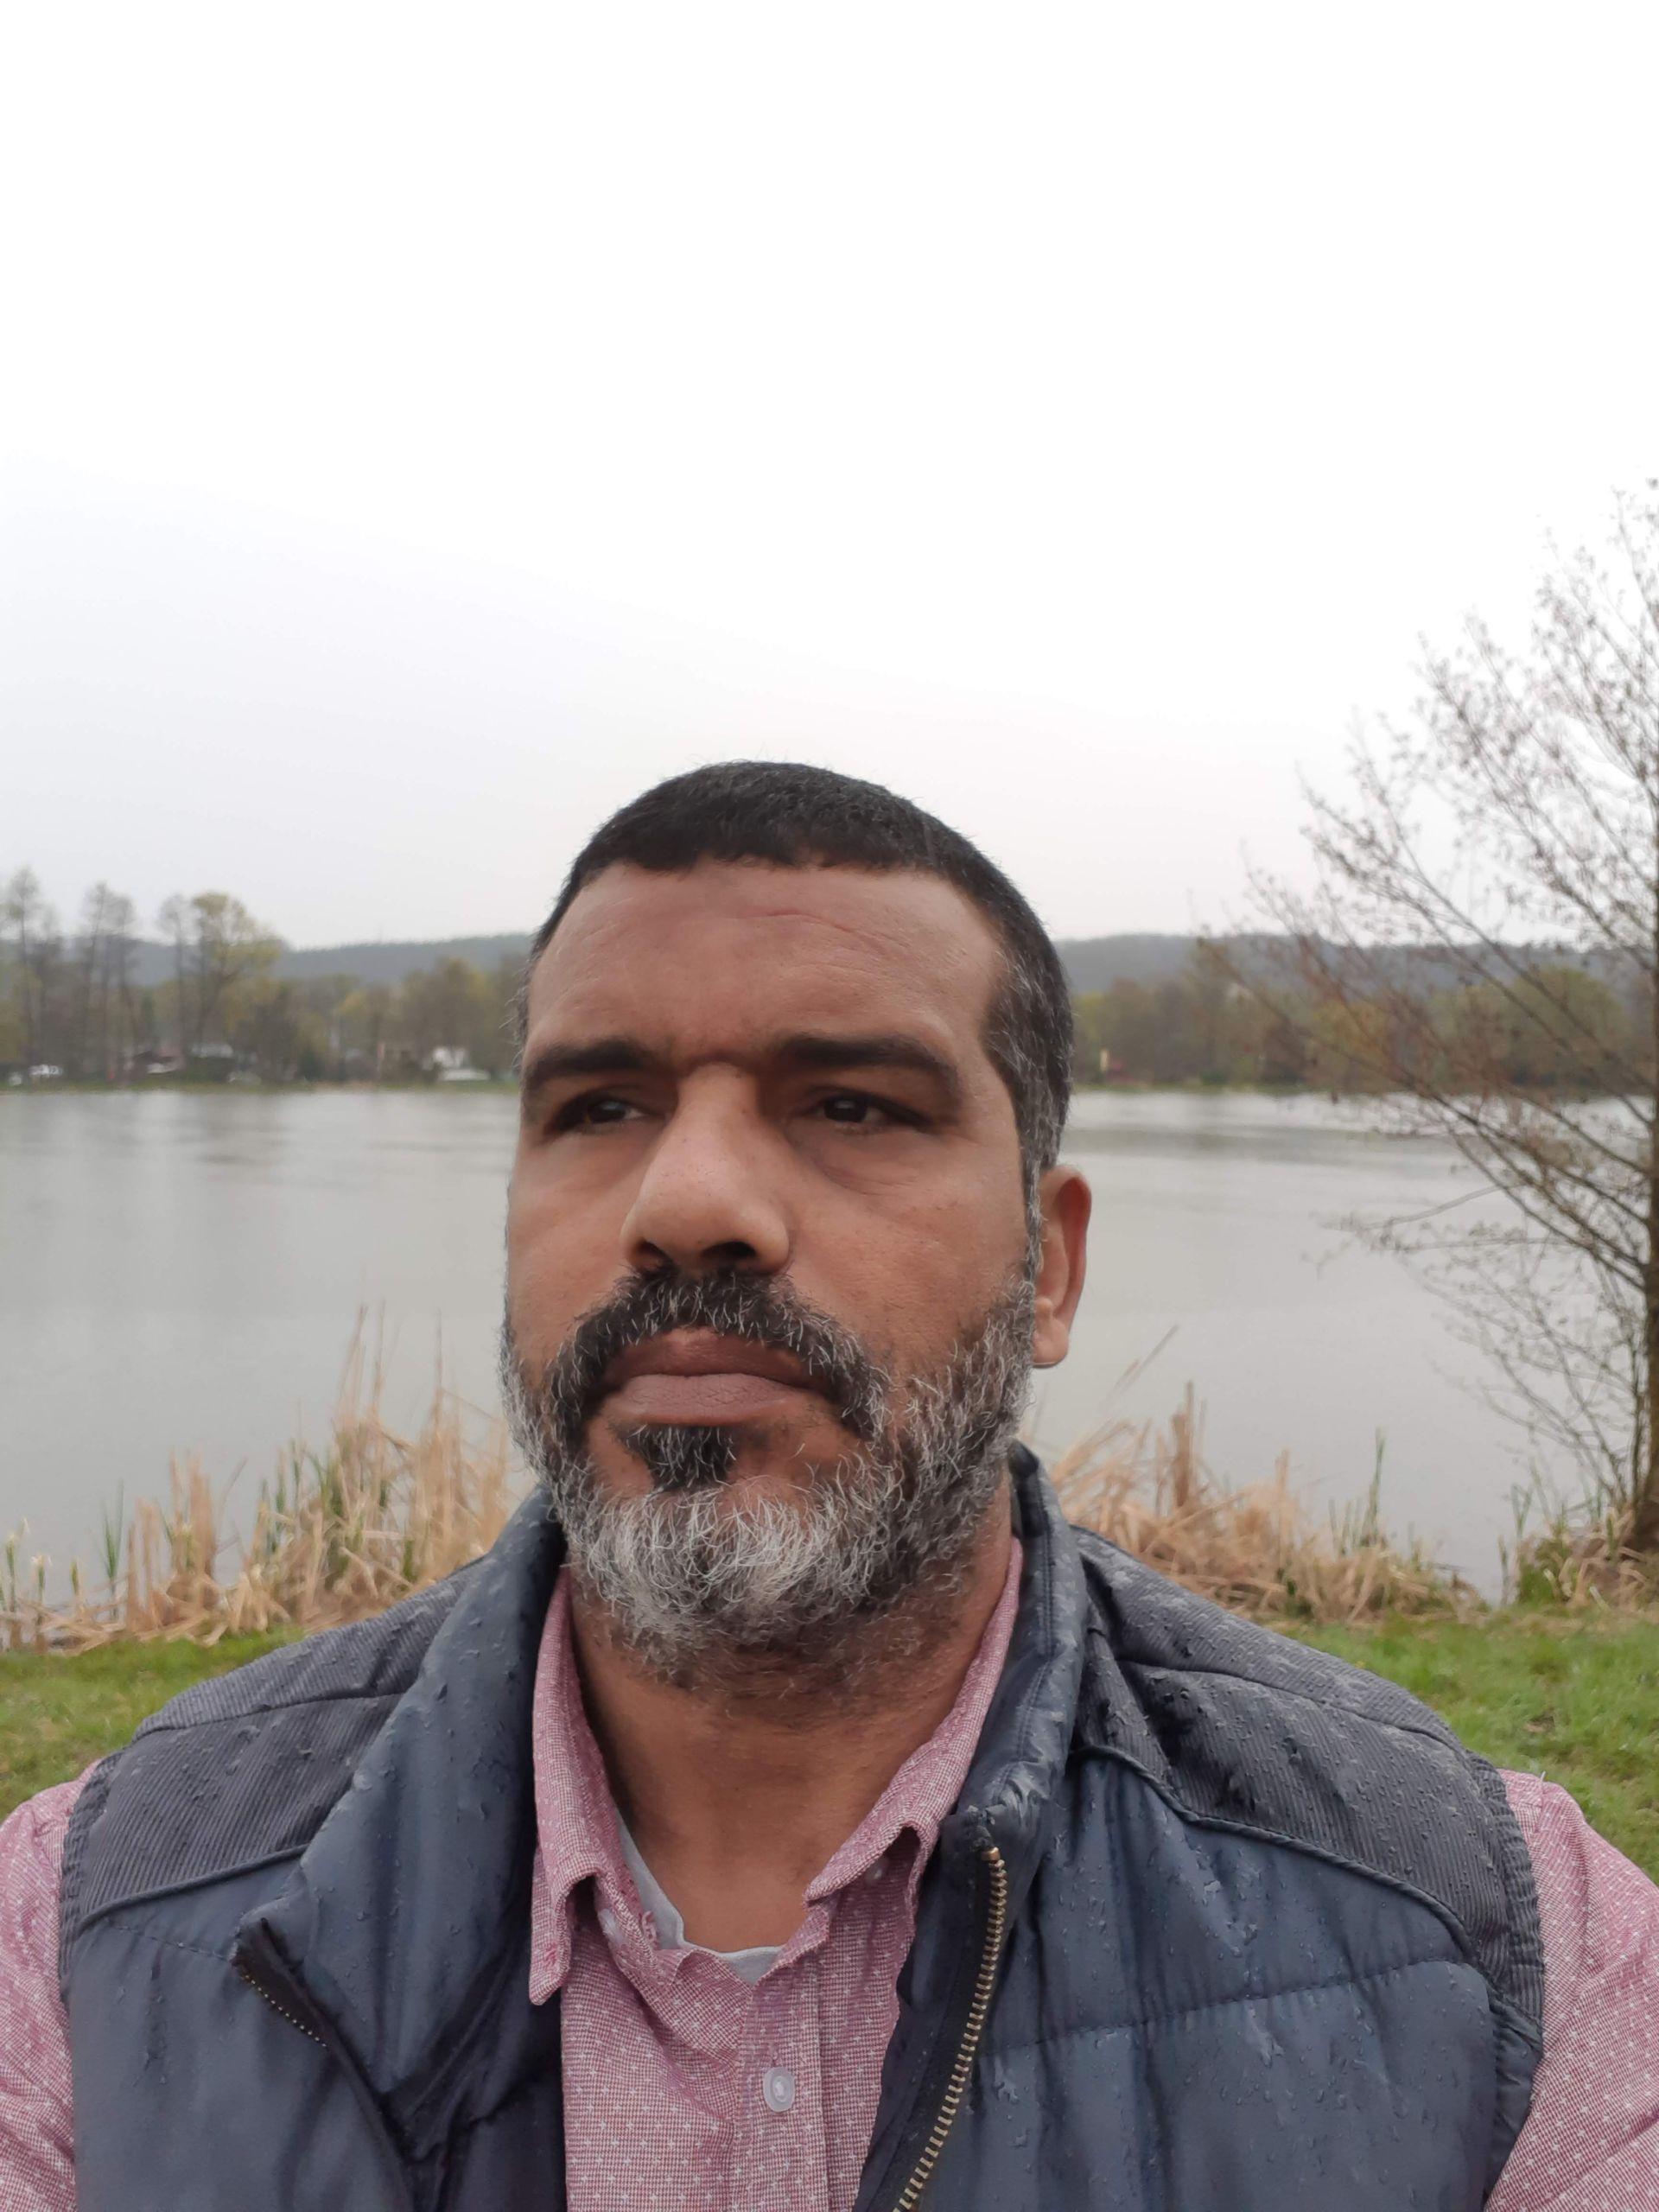 Hisham Sliti in Slovakia [Courtesy of Hisham Sliti]